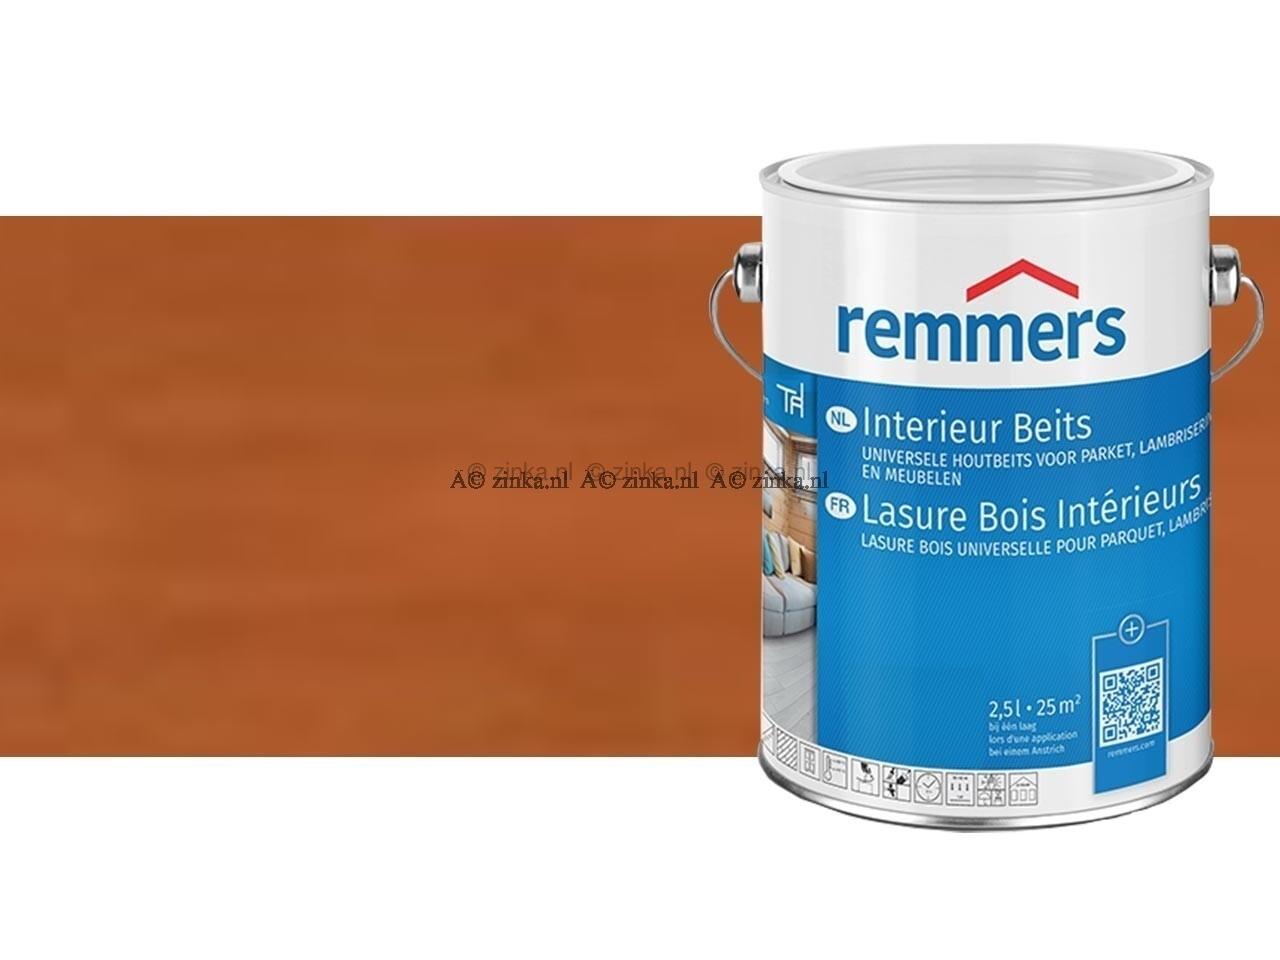 Interieur-Beits 2307 Kersen 100ml proefverpakking